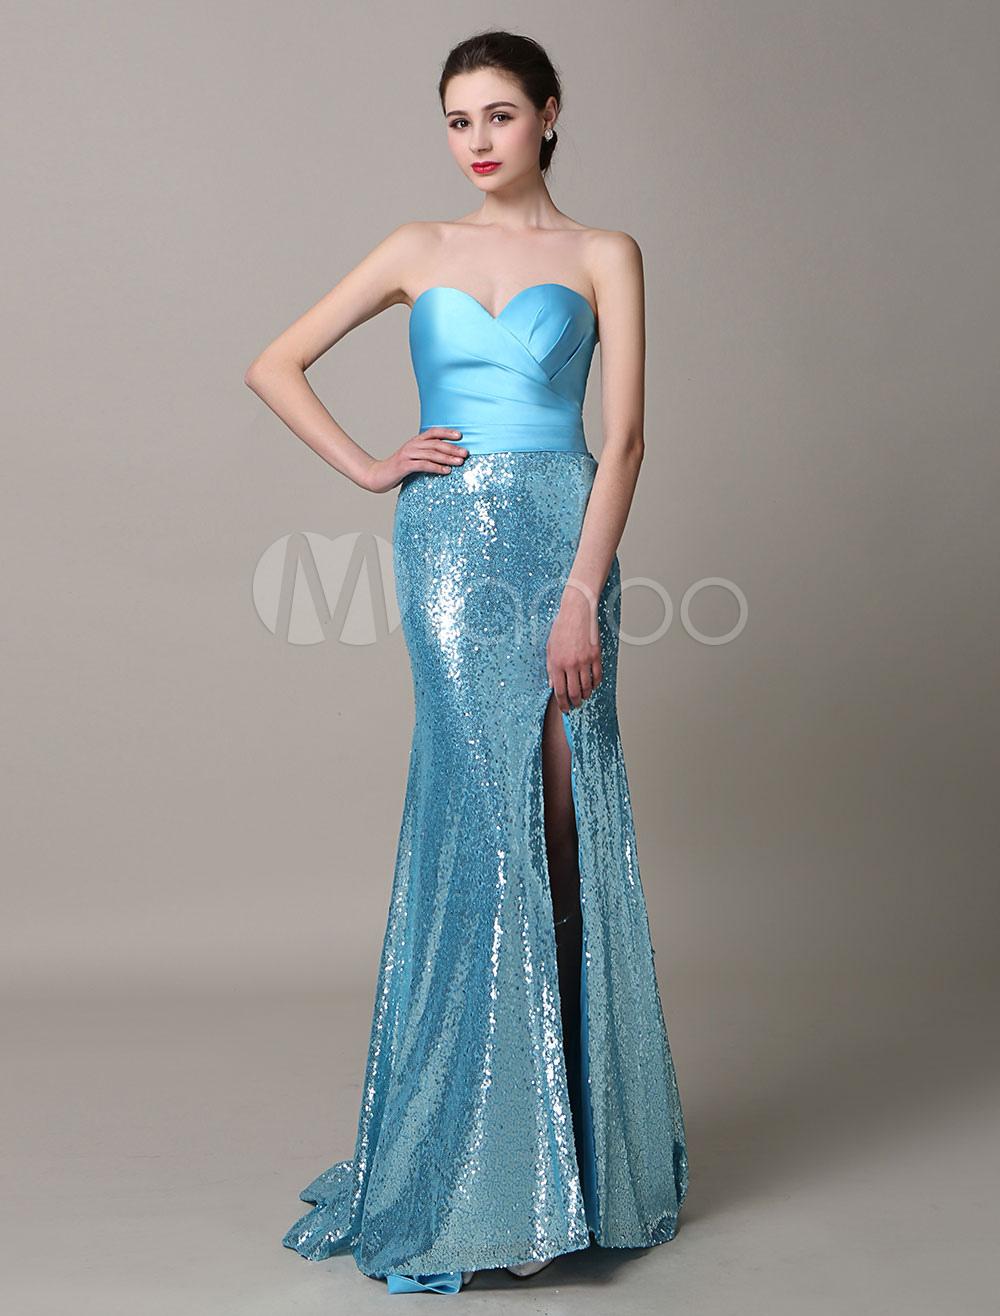 Blue Split Strapless Satin Sequined Evening Dress (Wedding Evening Dresses) photo